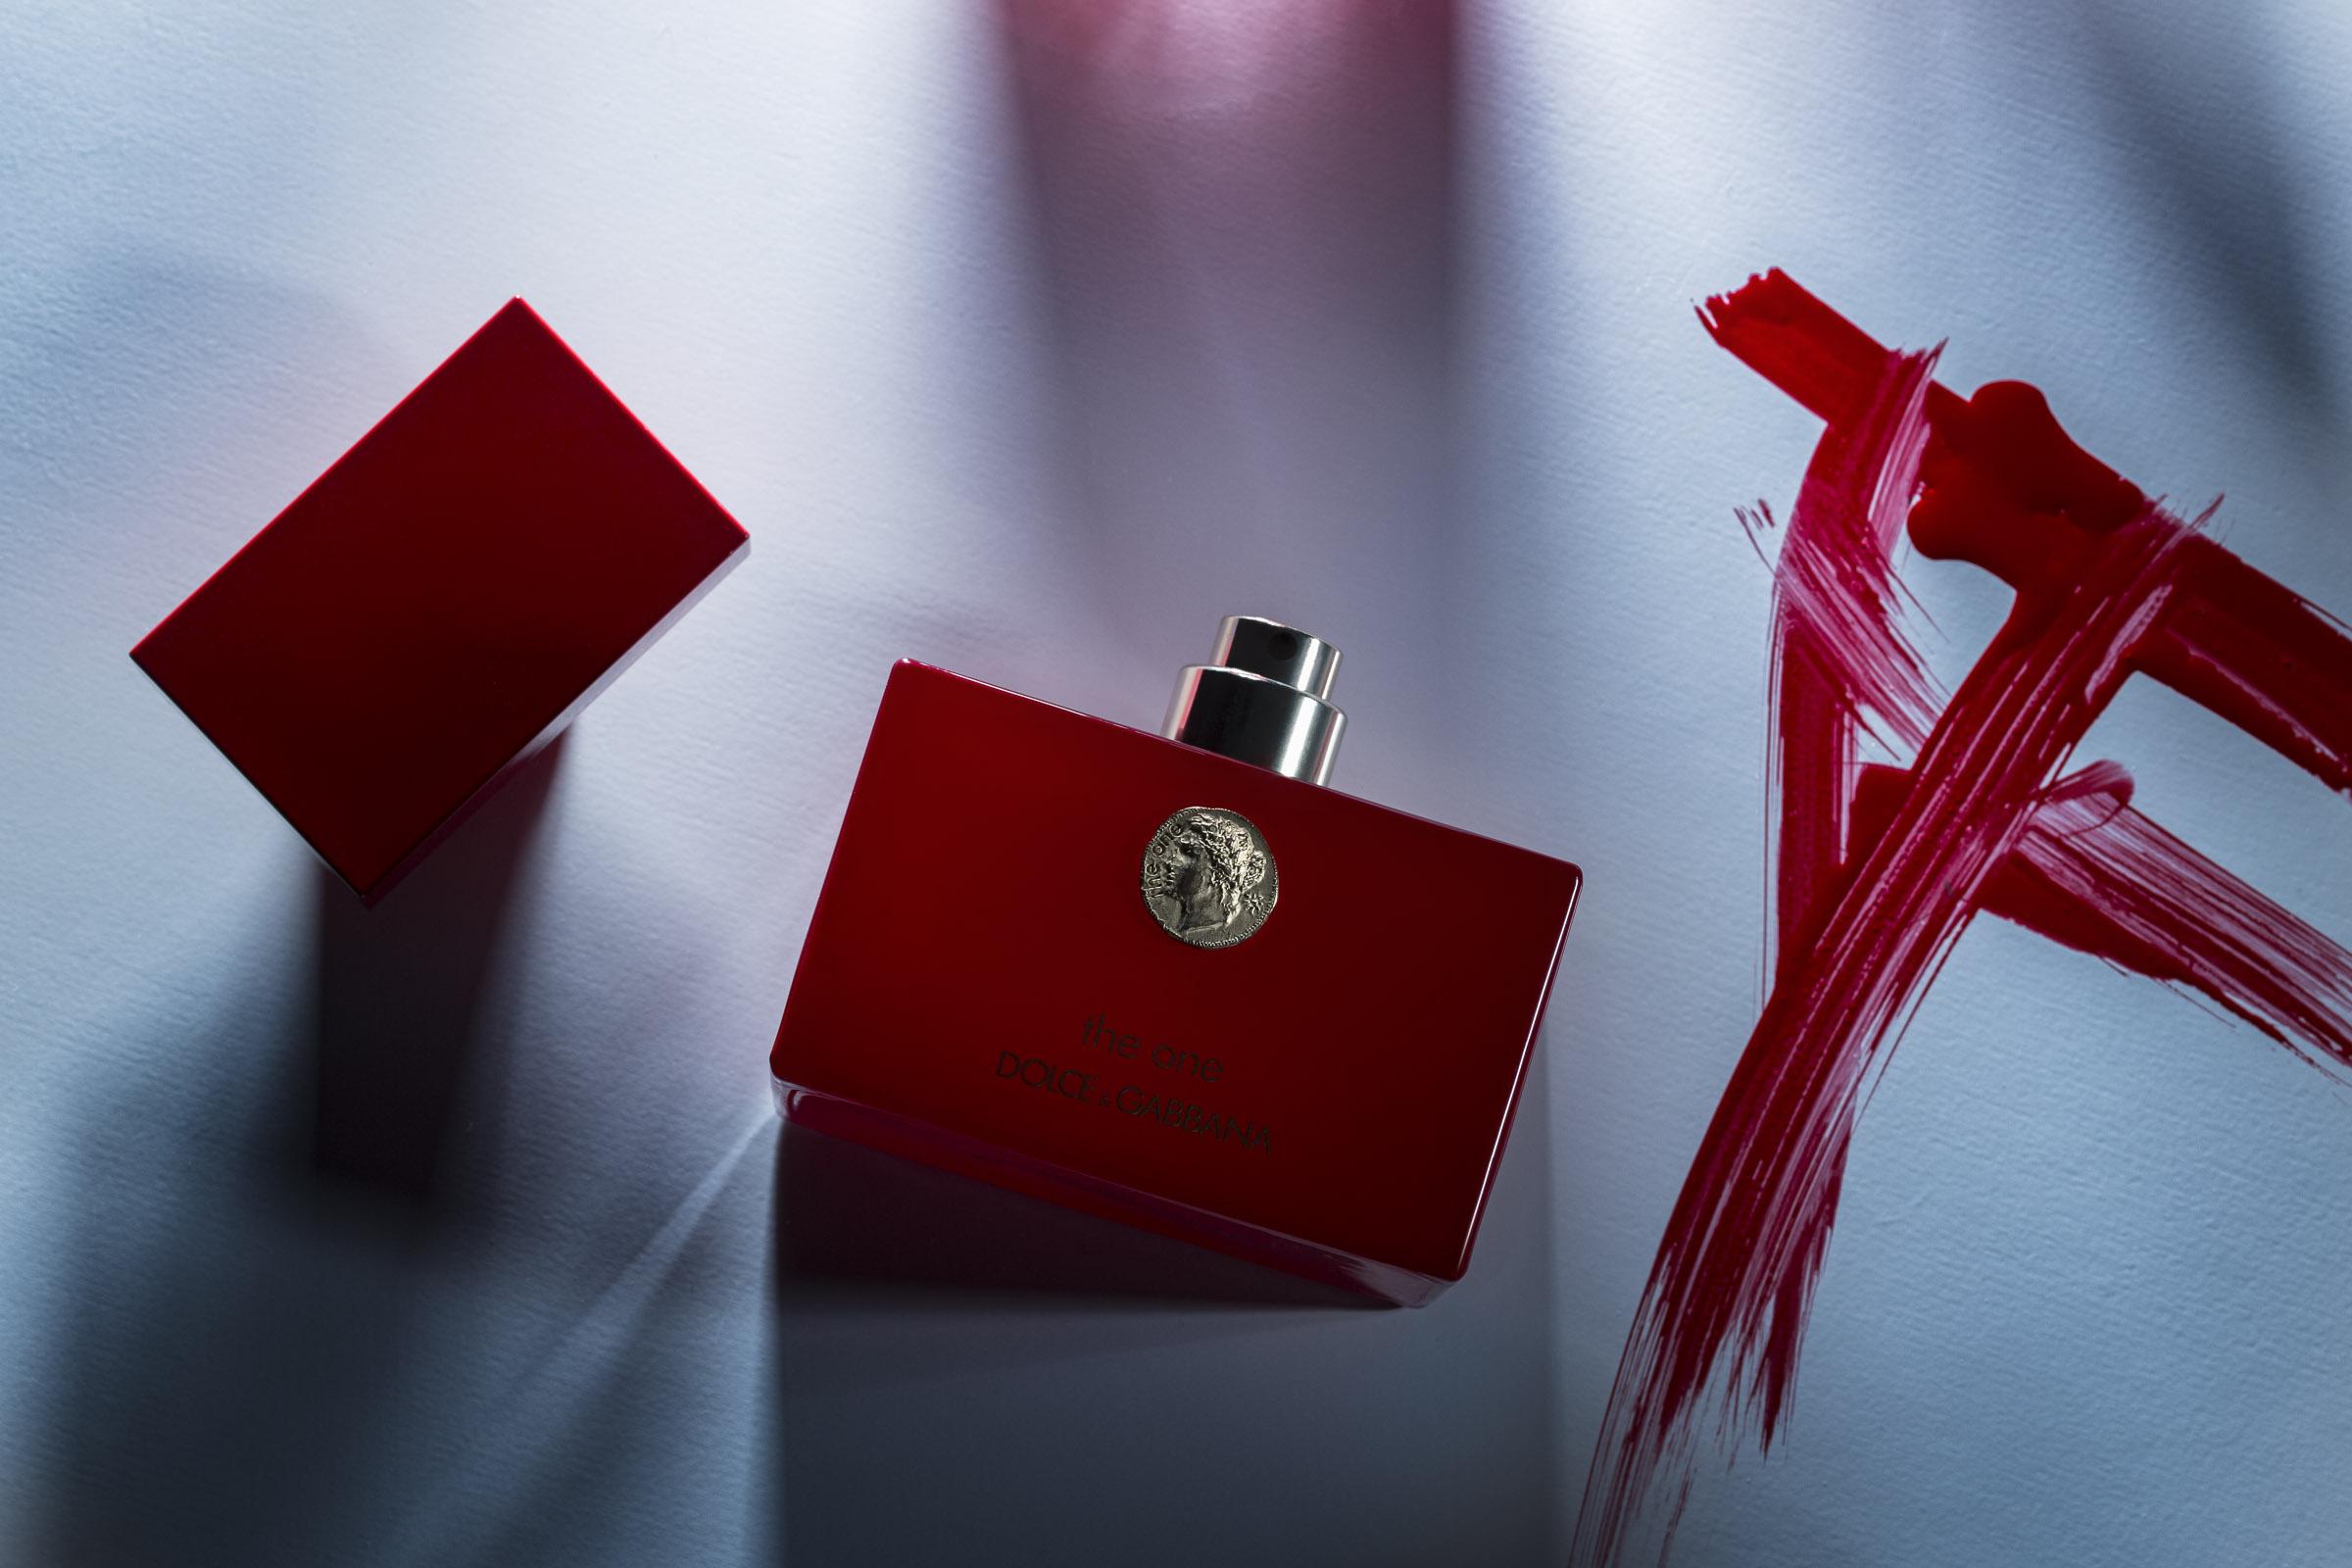 photographie-produit-parfum-montreal-dolce gabana-1